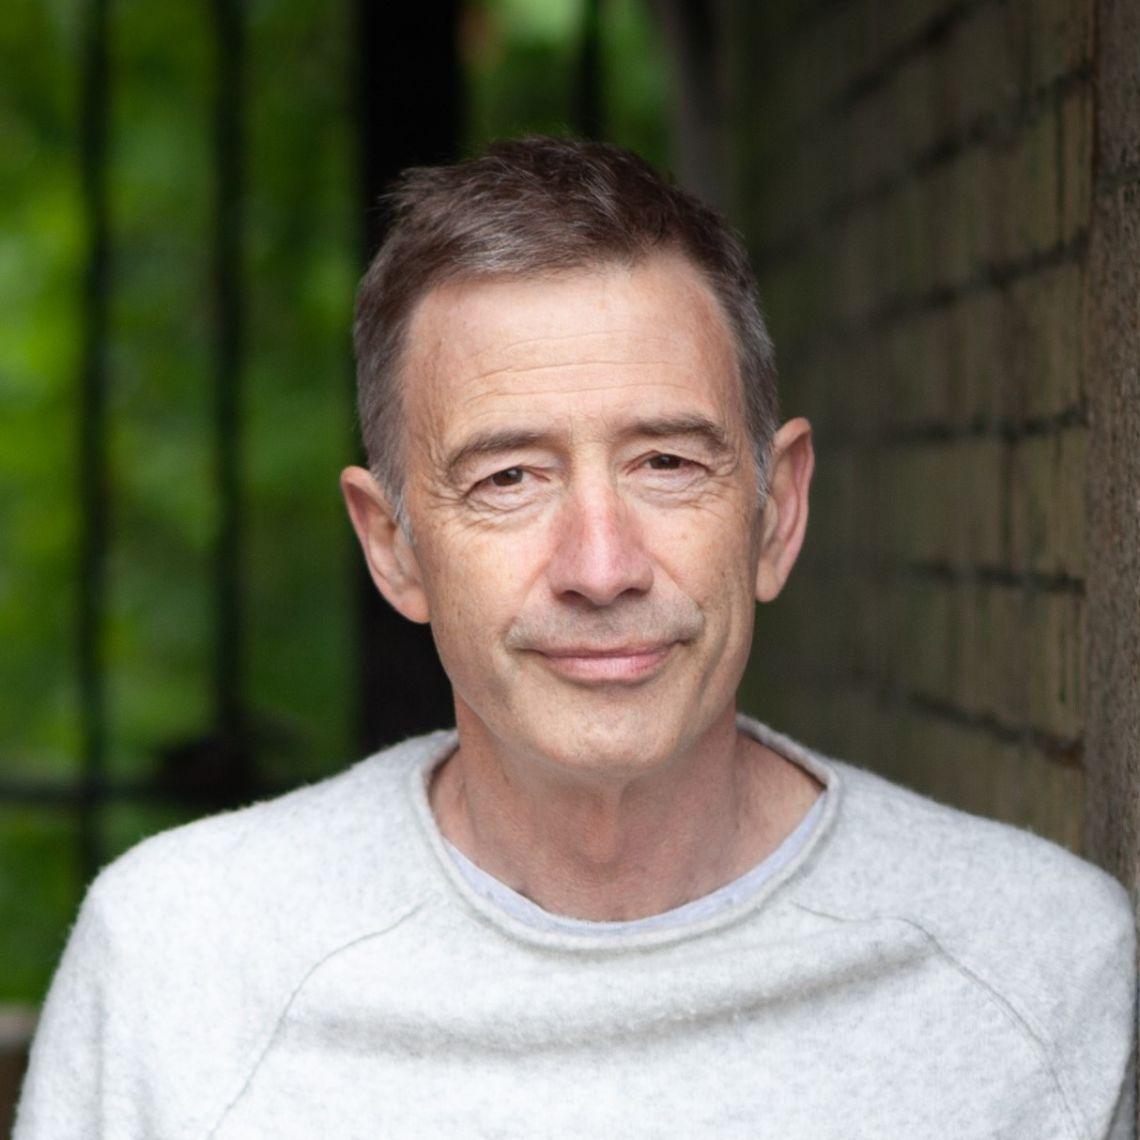 Professor Michael Parker